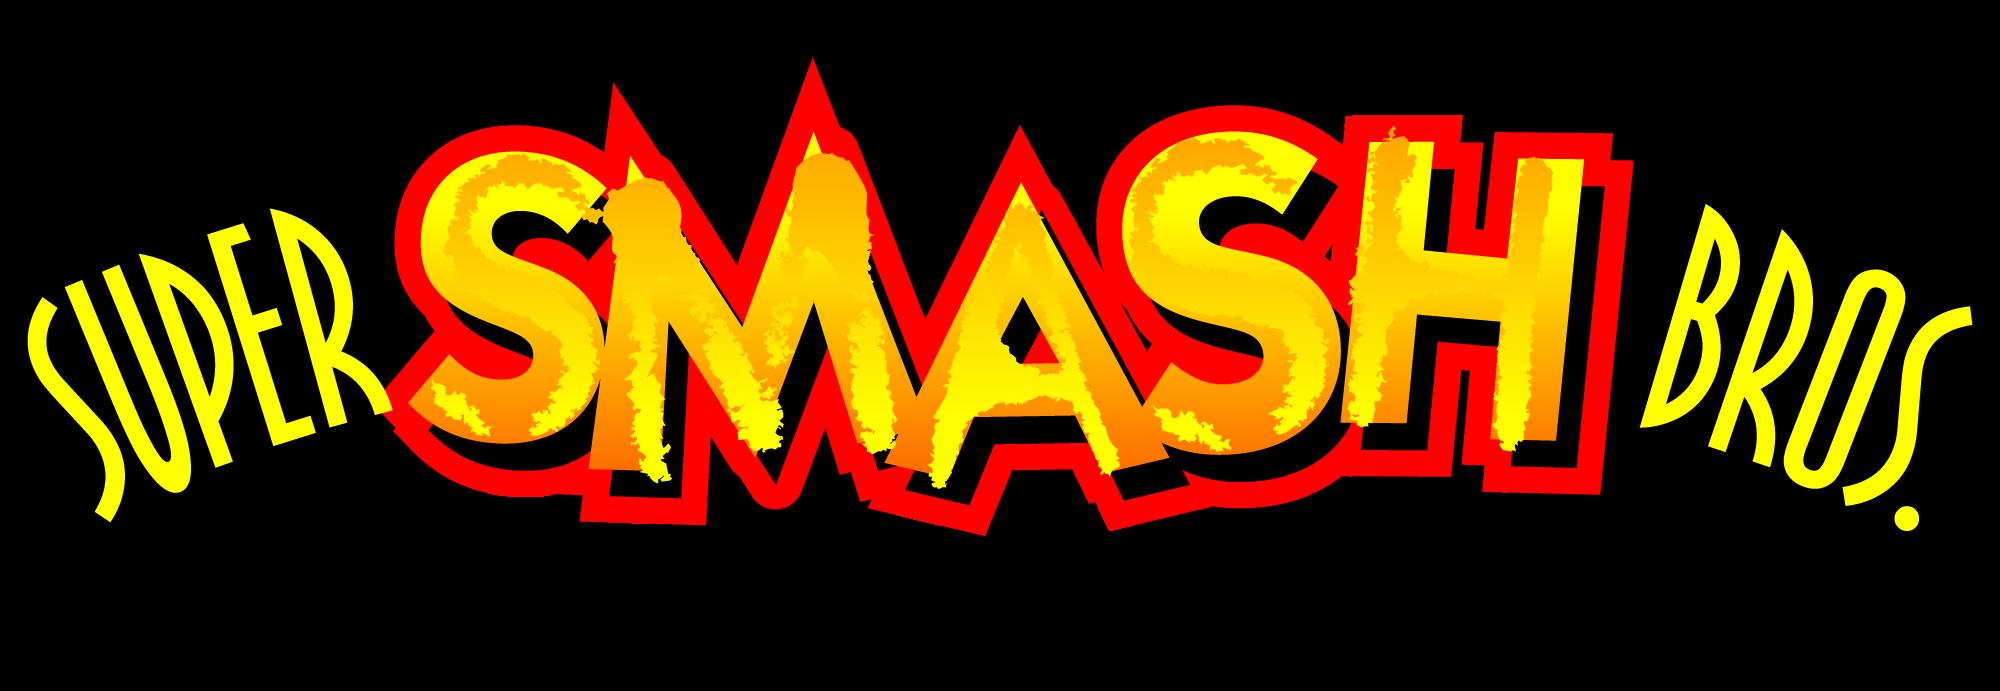 Super Smash Bros. 64 Logo | Accurate Restoration by ...